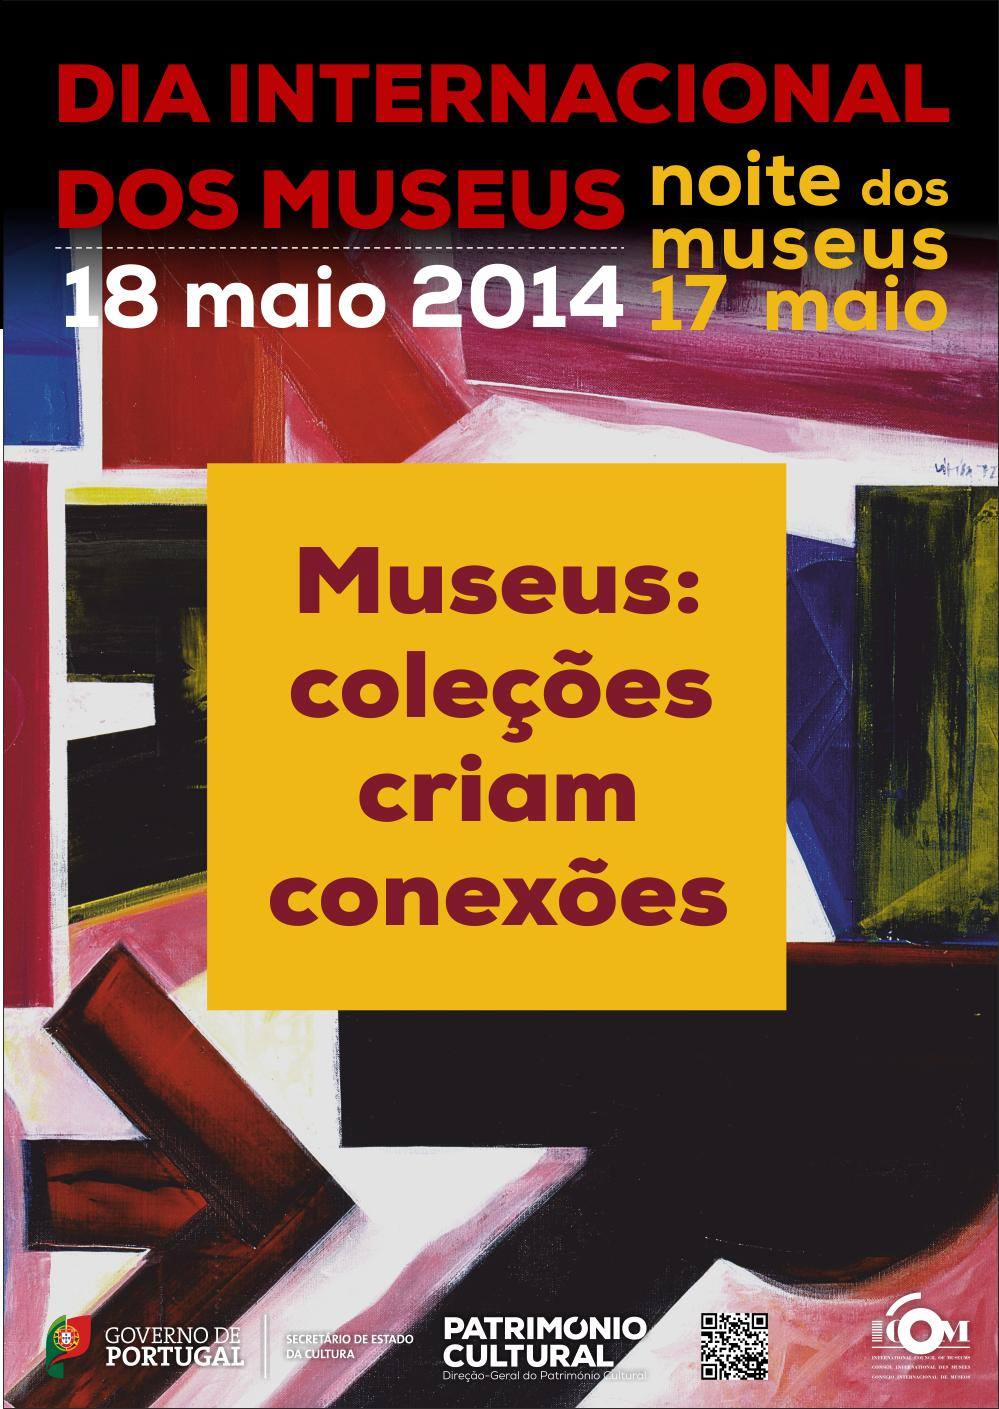 Dia Internacional dos Museus - Programas grátis